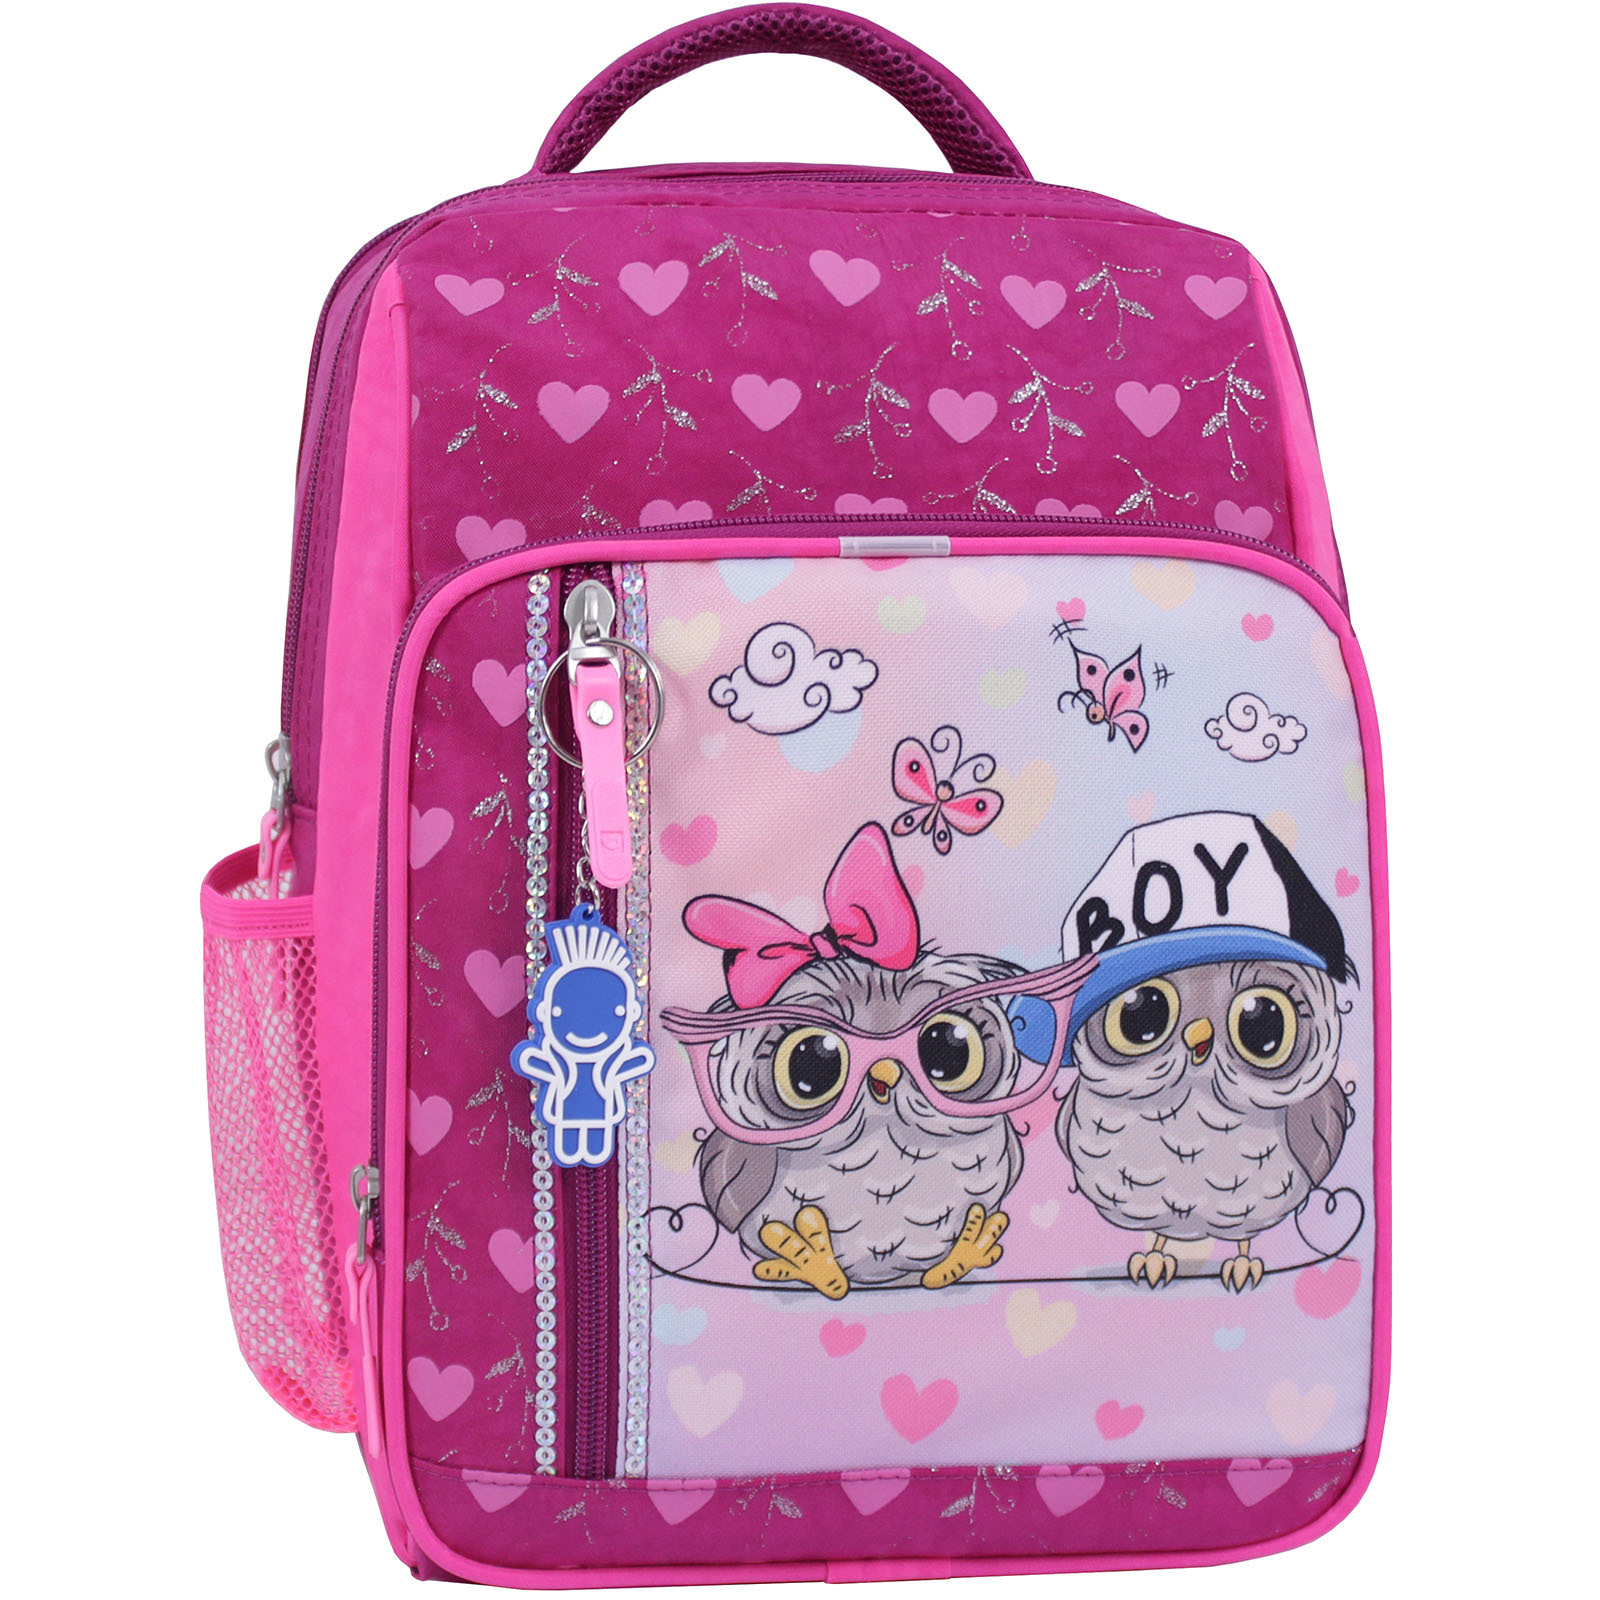 Школьные рюкзаки Рюкзак школьный Bagland Школьник 8 л. 143 малиновый 515 (0012870) IMG_0500_суб.515_.JPG